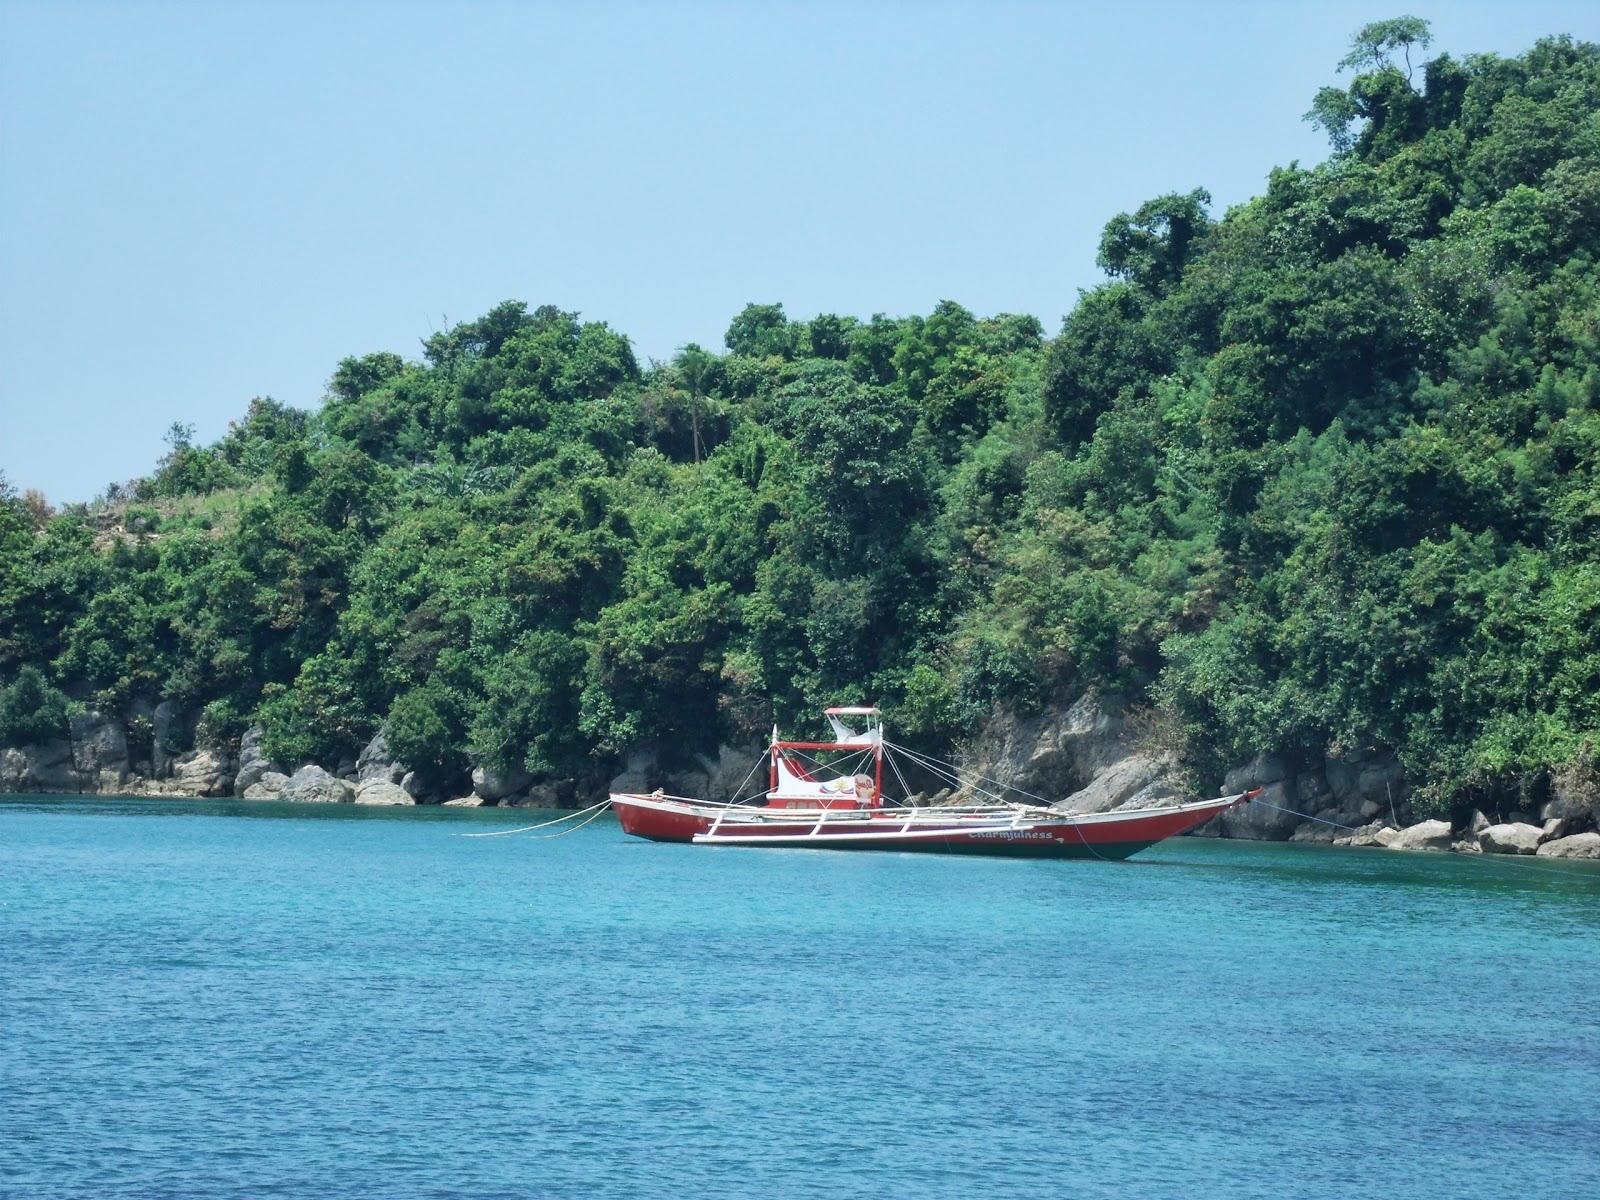 Philippines Philippine Destinations Cebu Manila Palawan Boracay